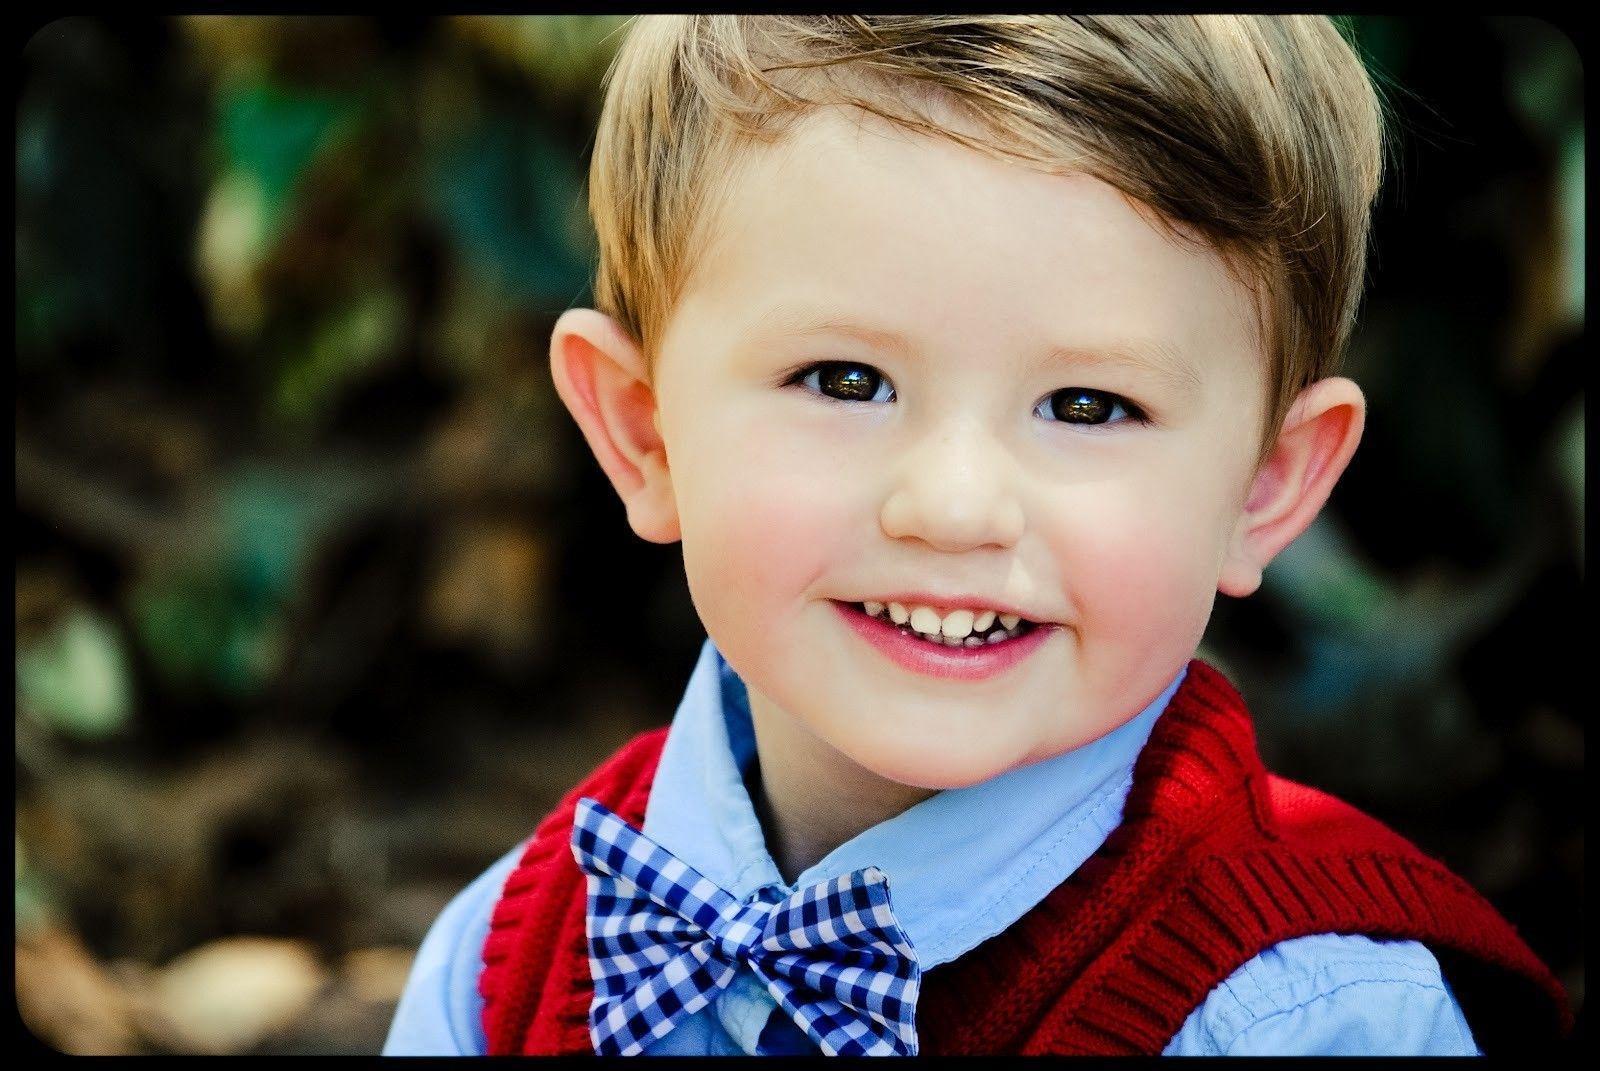 Cute Boy Wallpapers - Top Free Cute Boy ...